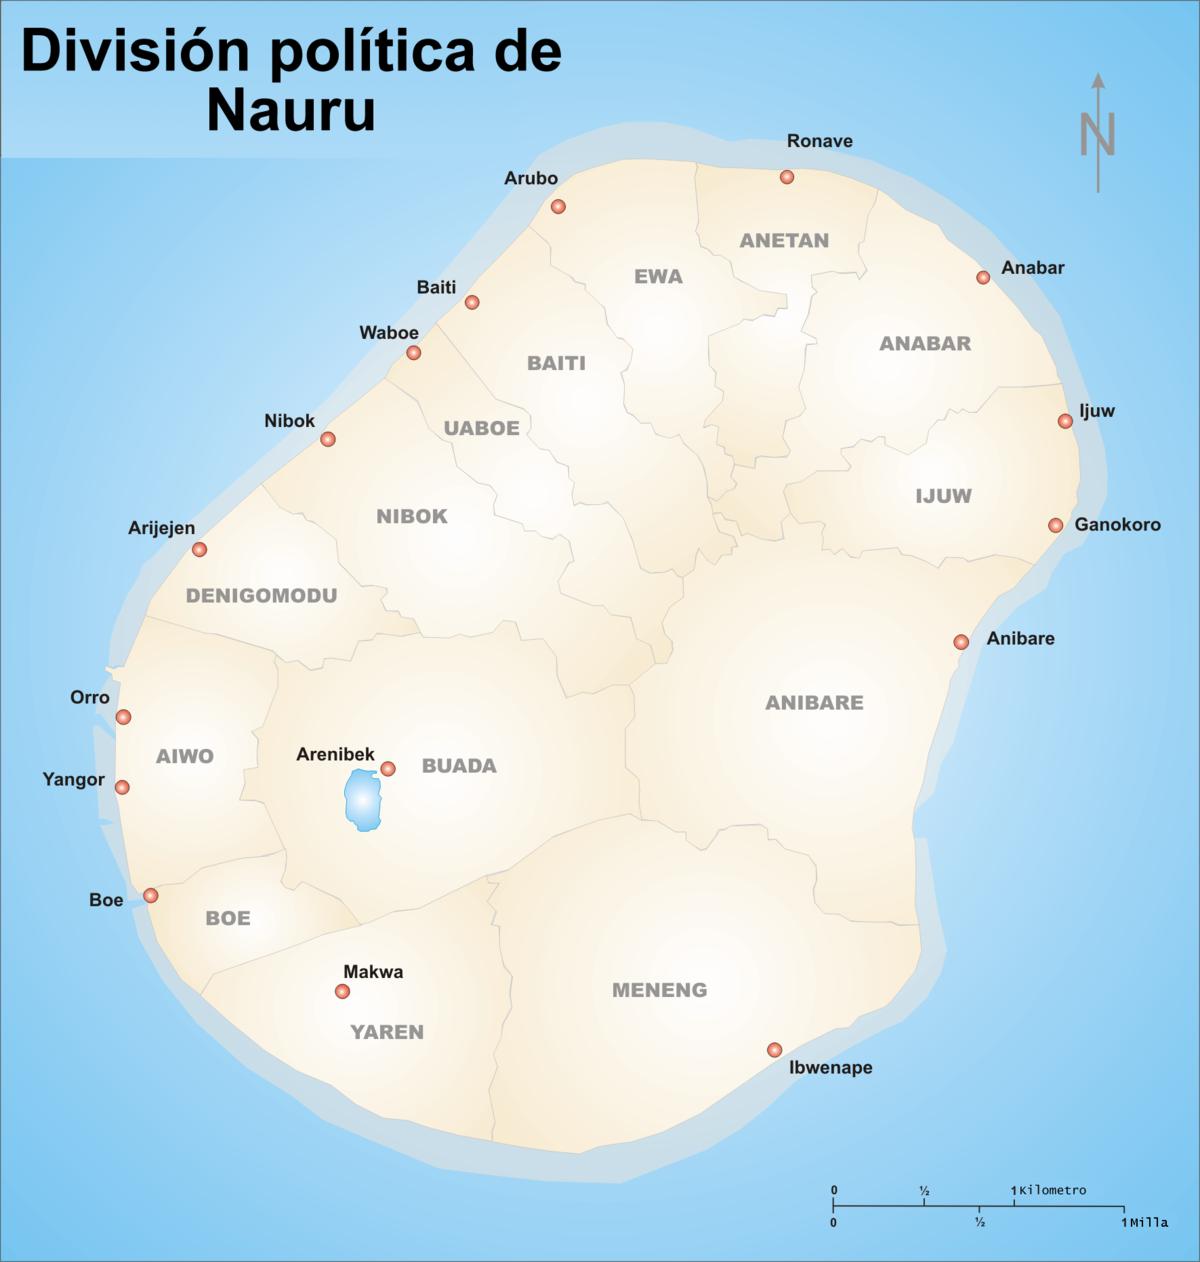 Republic of Nauru: area, population, president, state symbols 23